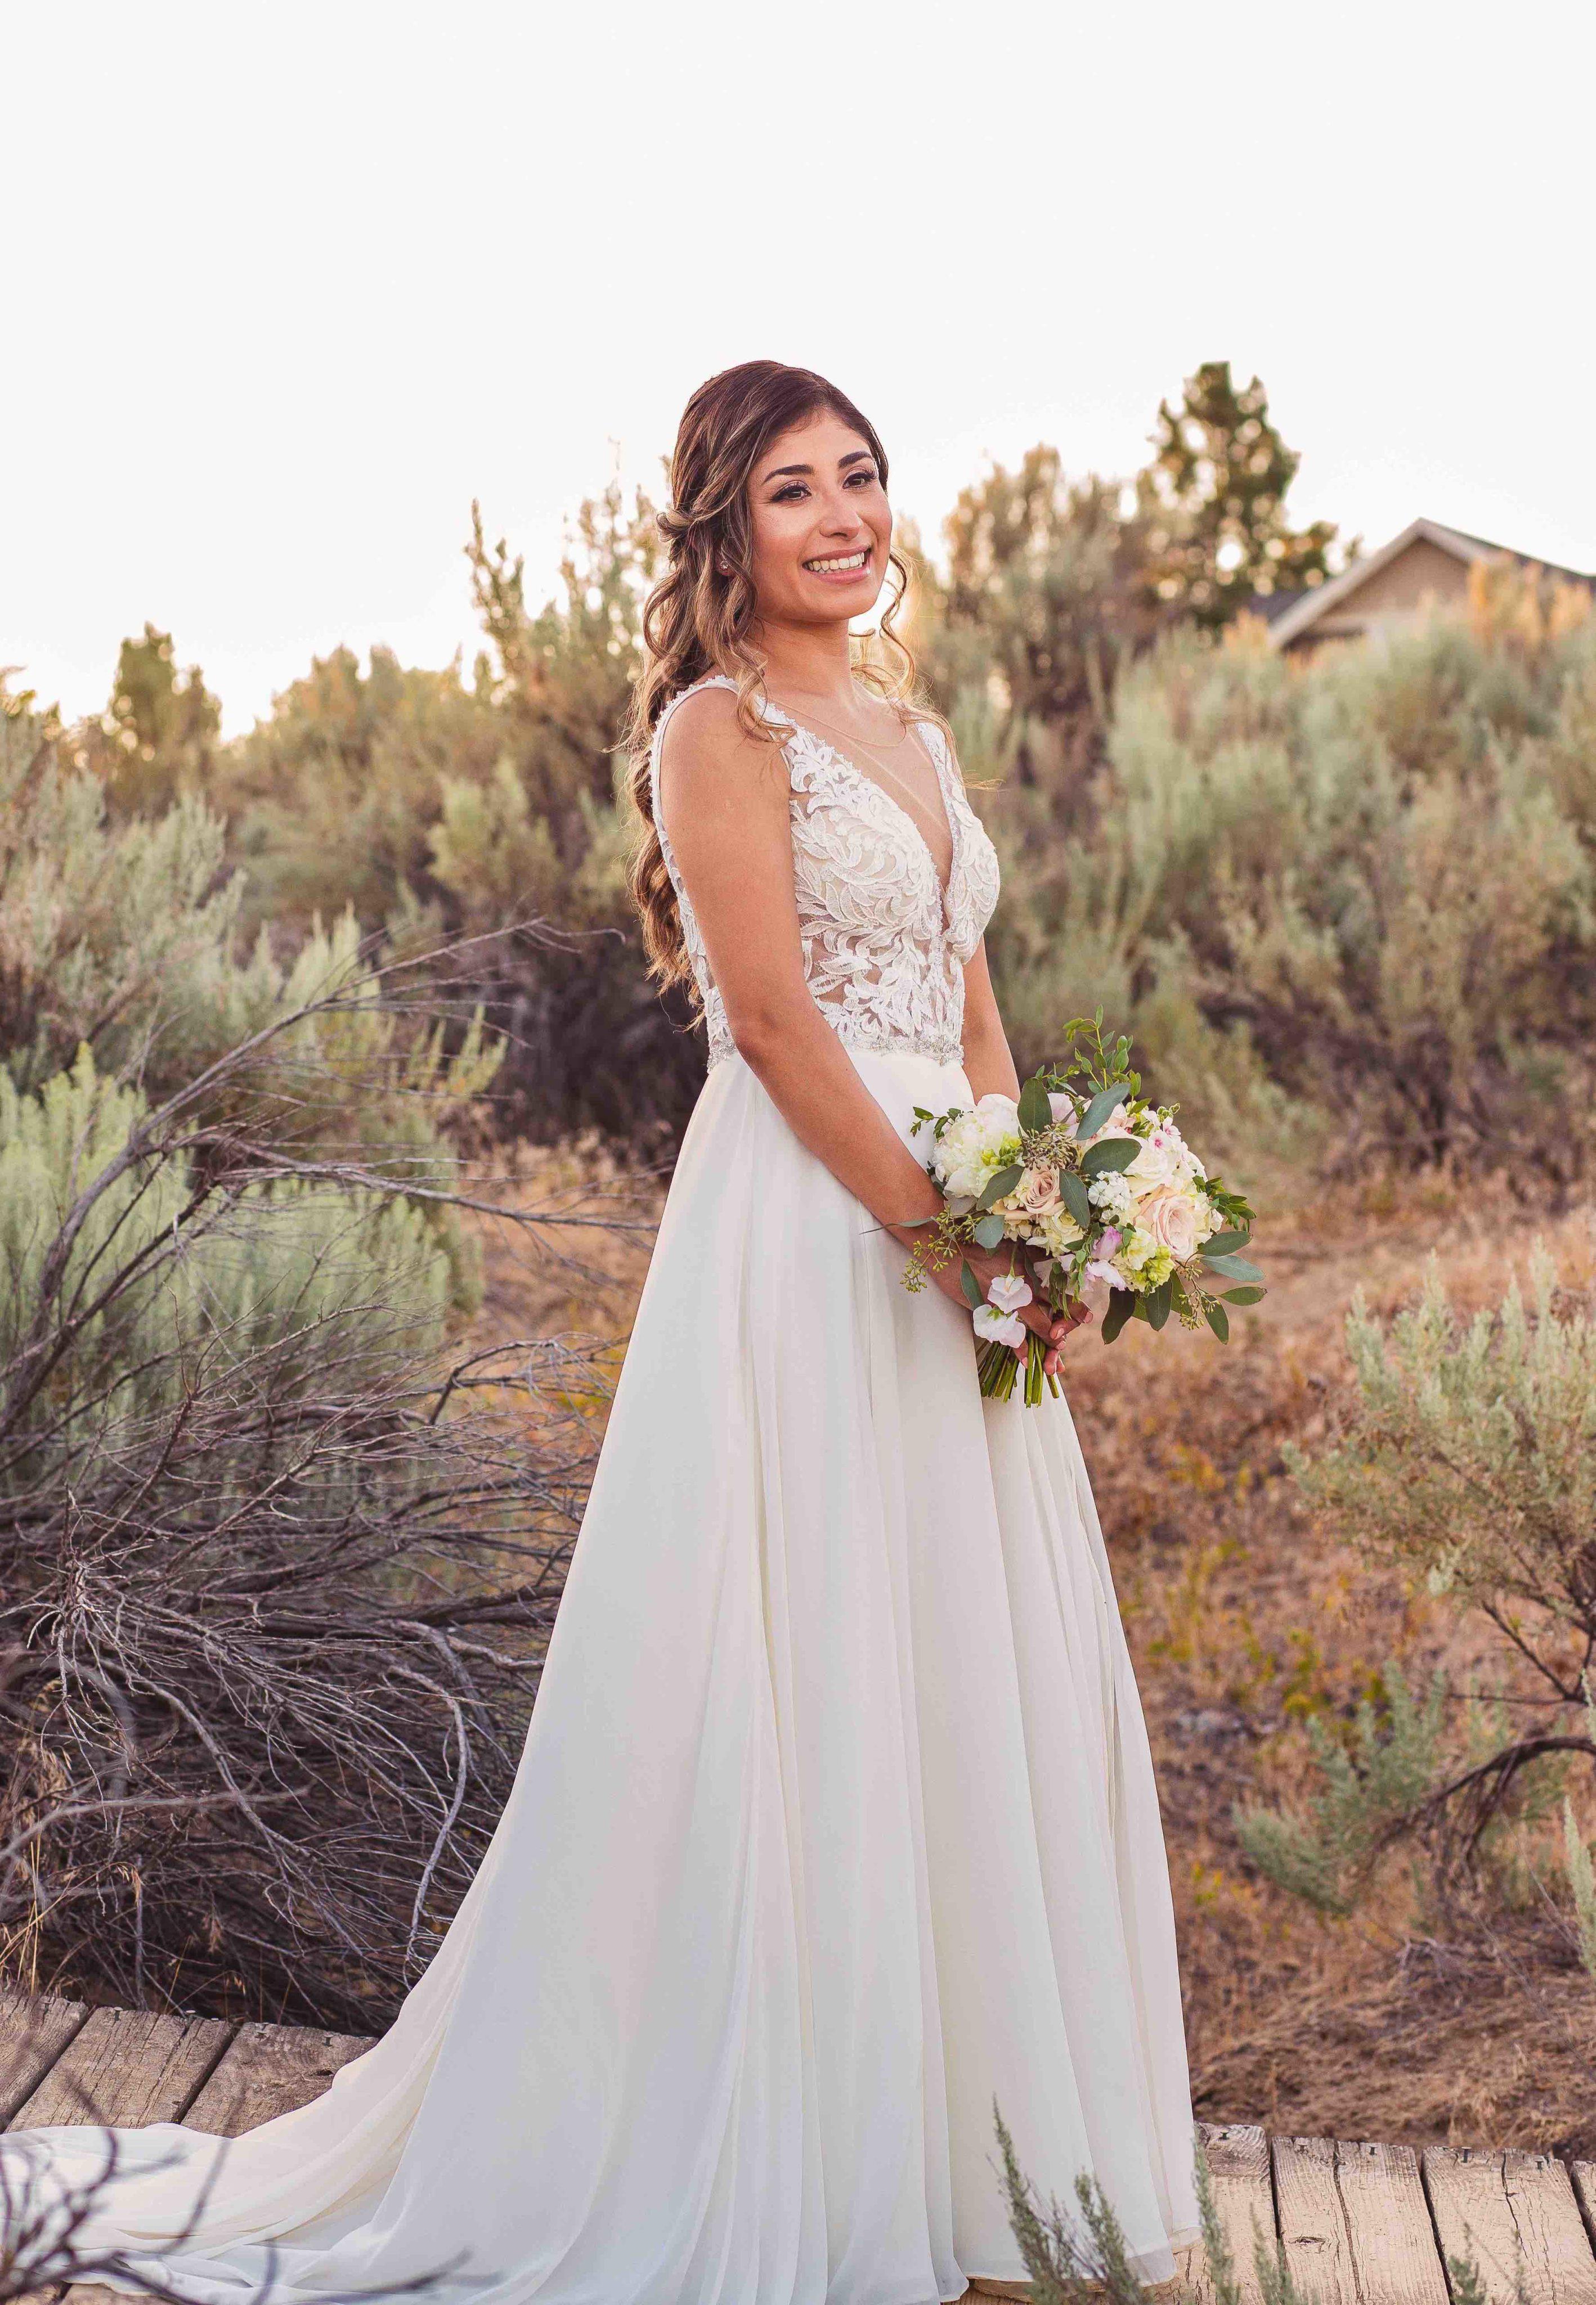 Solo shot of bride holding bouquet